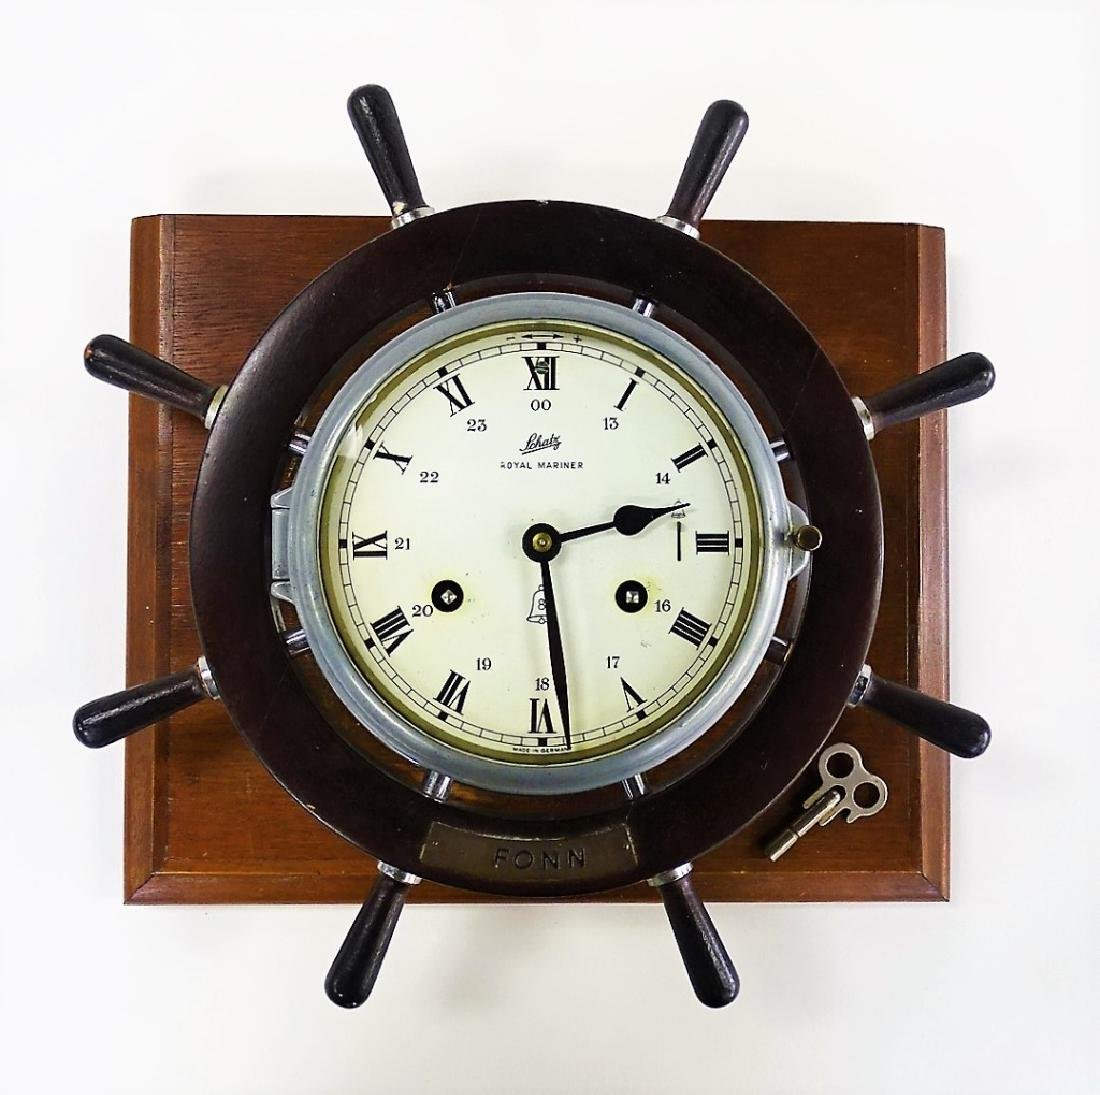 SCHATZ VINTAGE TIME & STRIKE SHIPS CLOCK